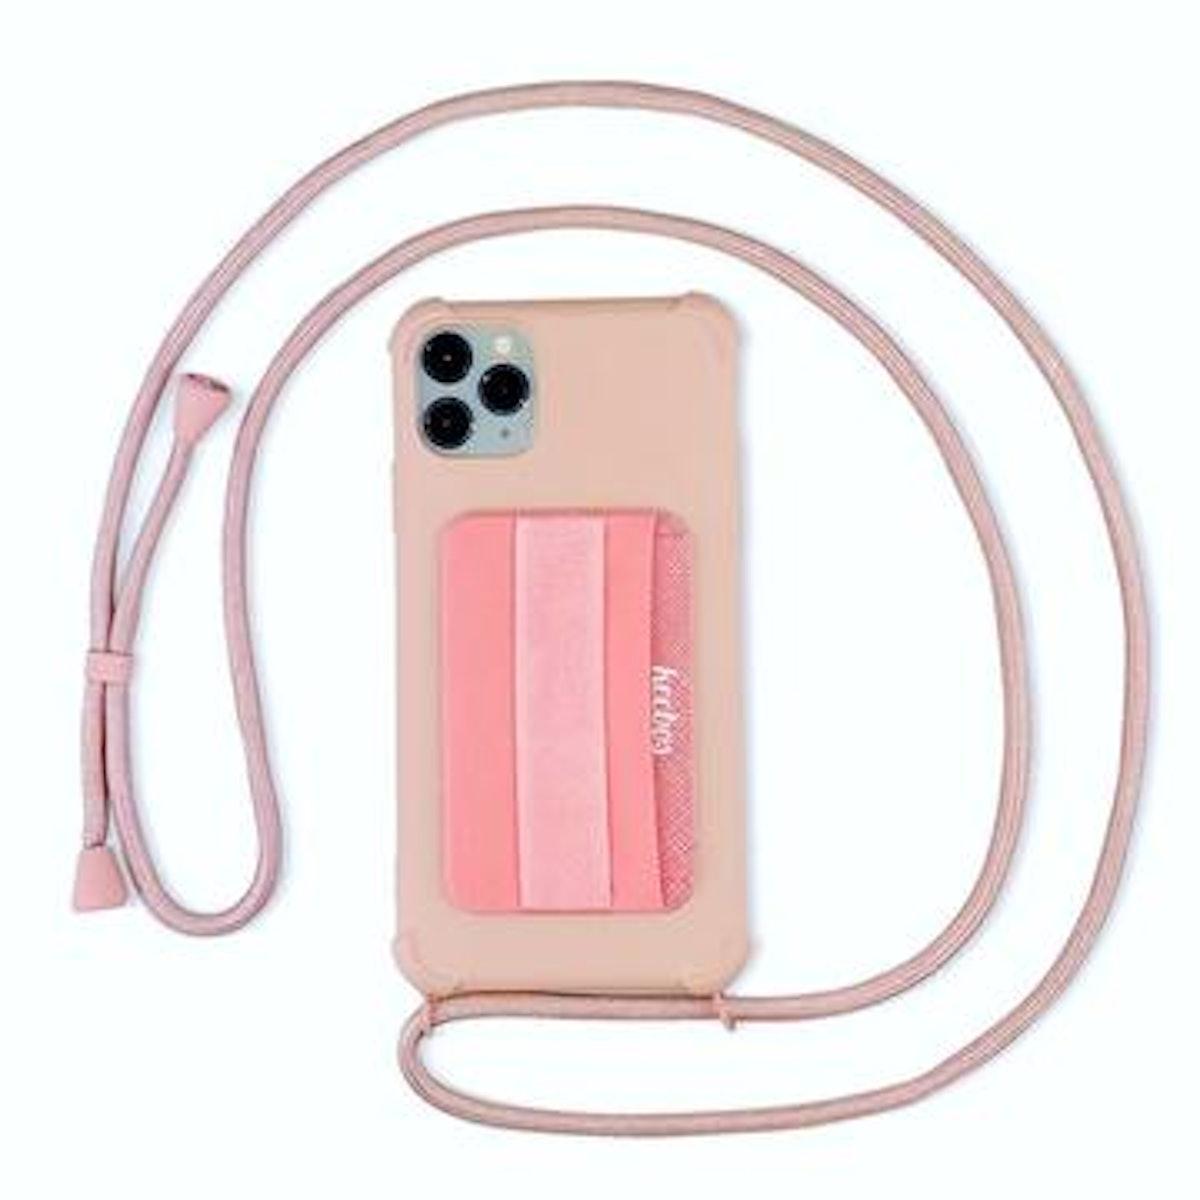 Keebos Crossbody iPhone Case in Rose